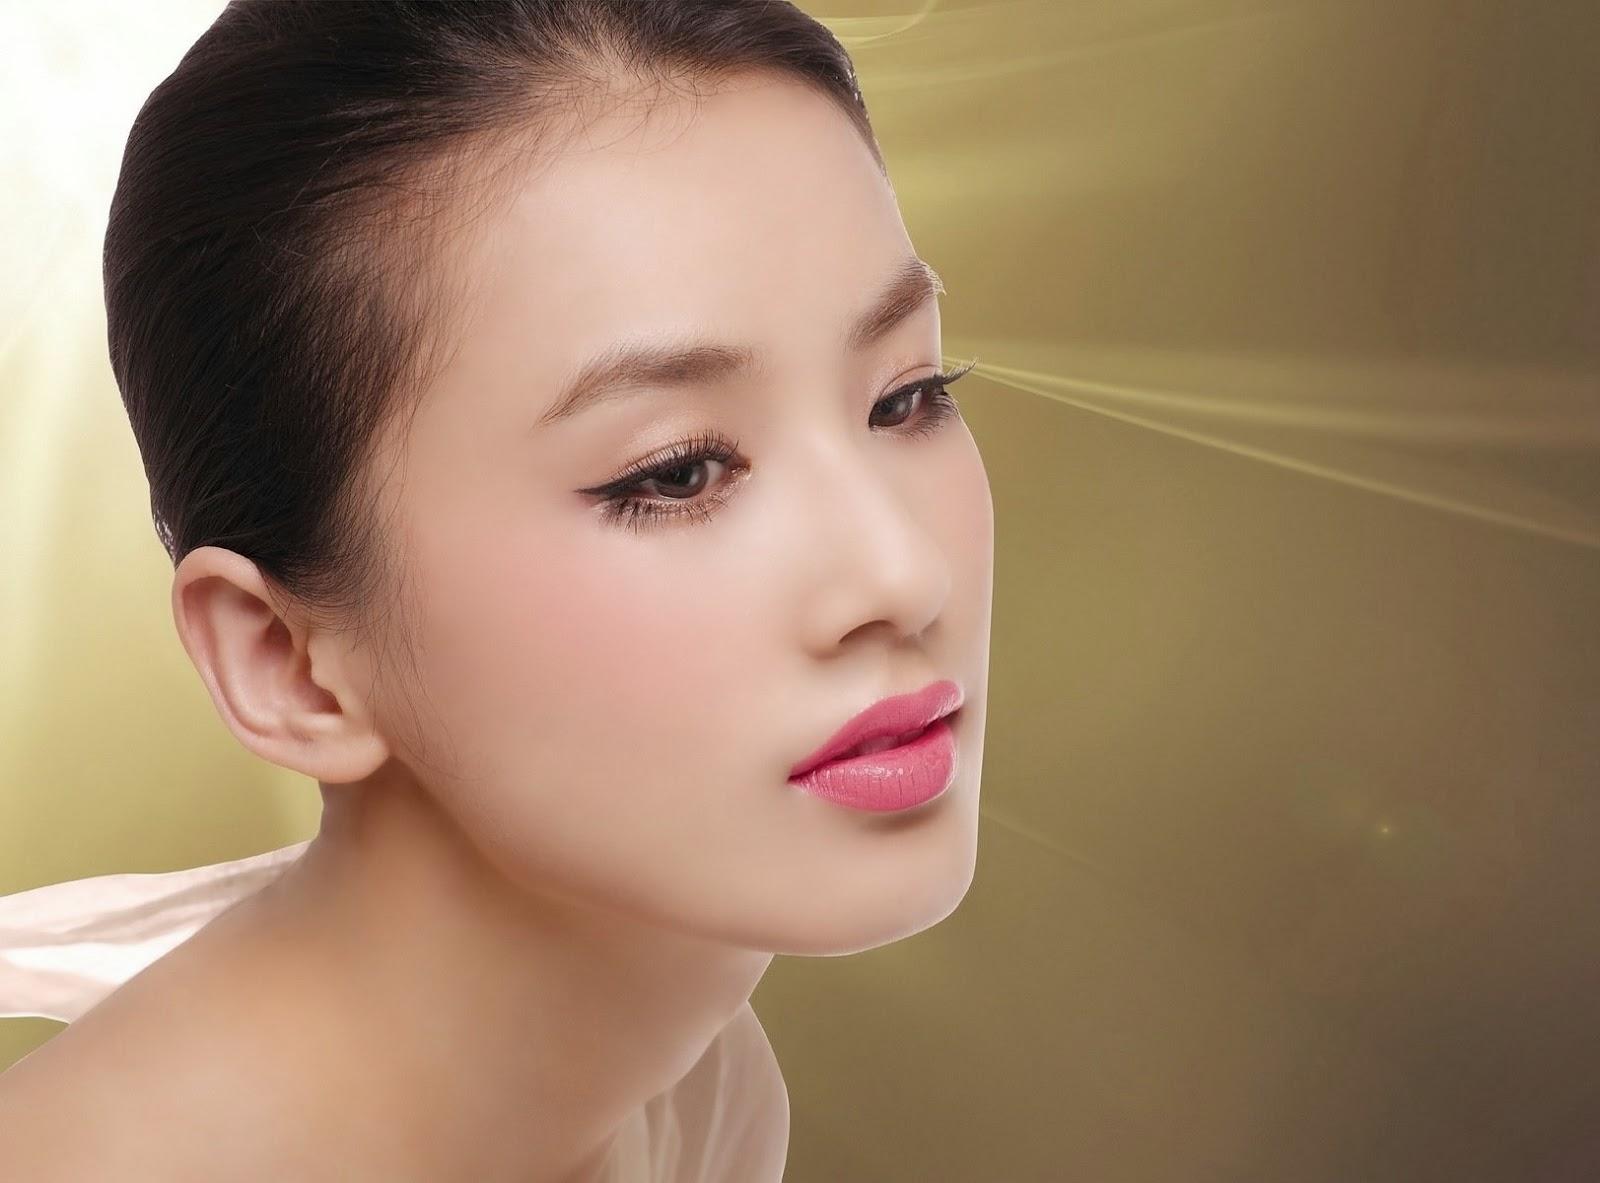 Free download hd wallpapers eva huang hd wallpapers eva huang hd wallpapers voltagebd Gallery